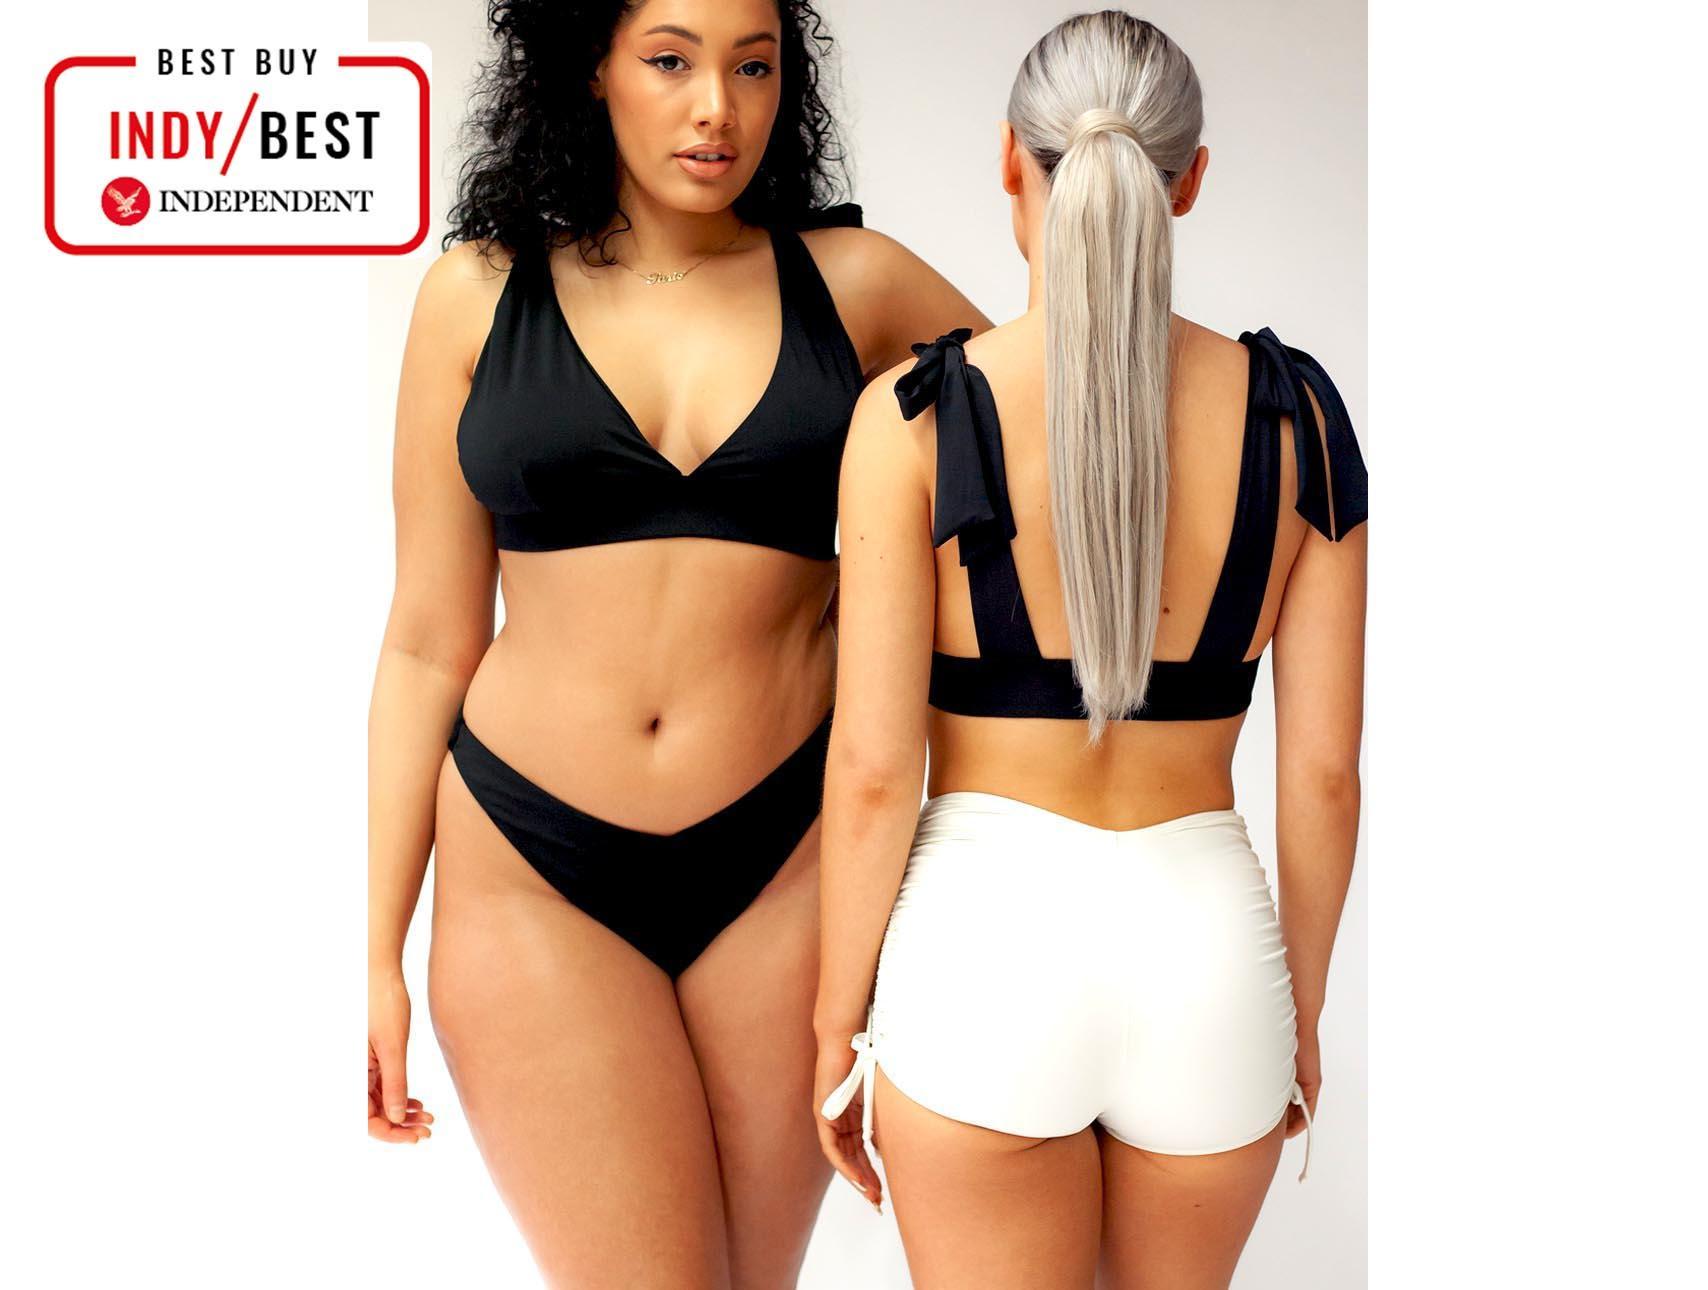 Flyrong High Waisted Padded Halter Bikini Sets for Women Swimming Costume for Women